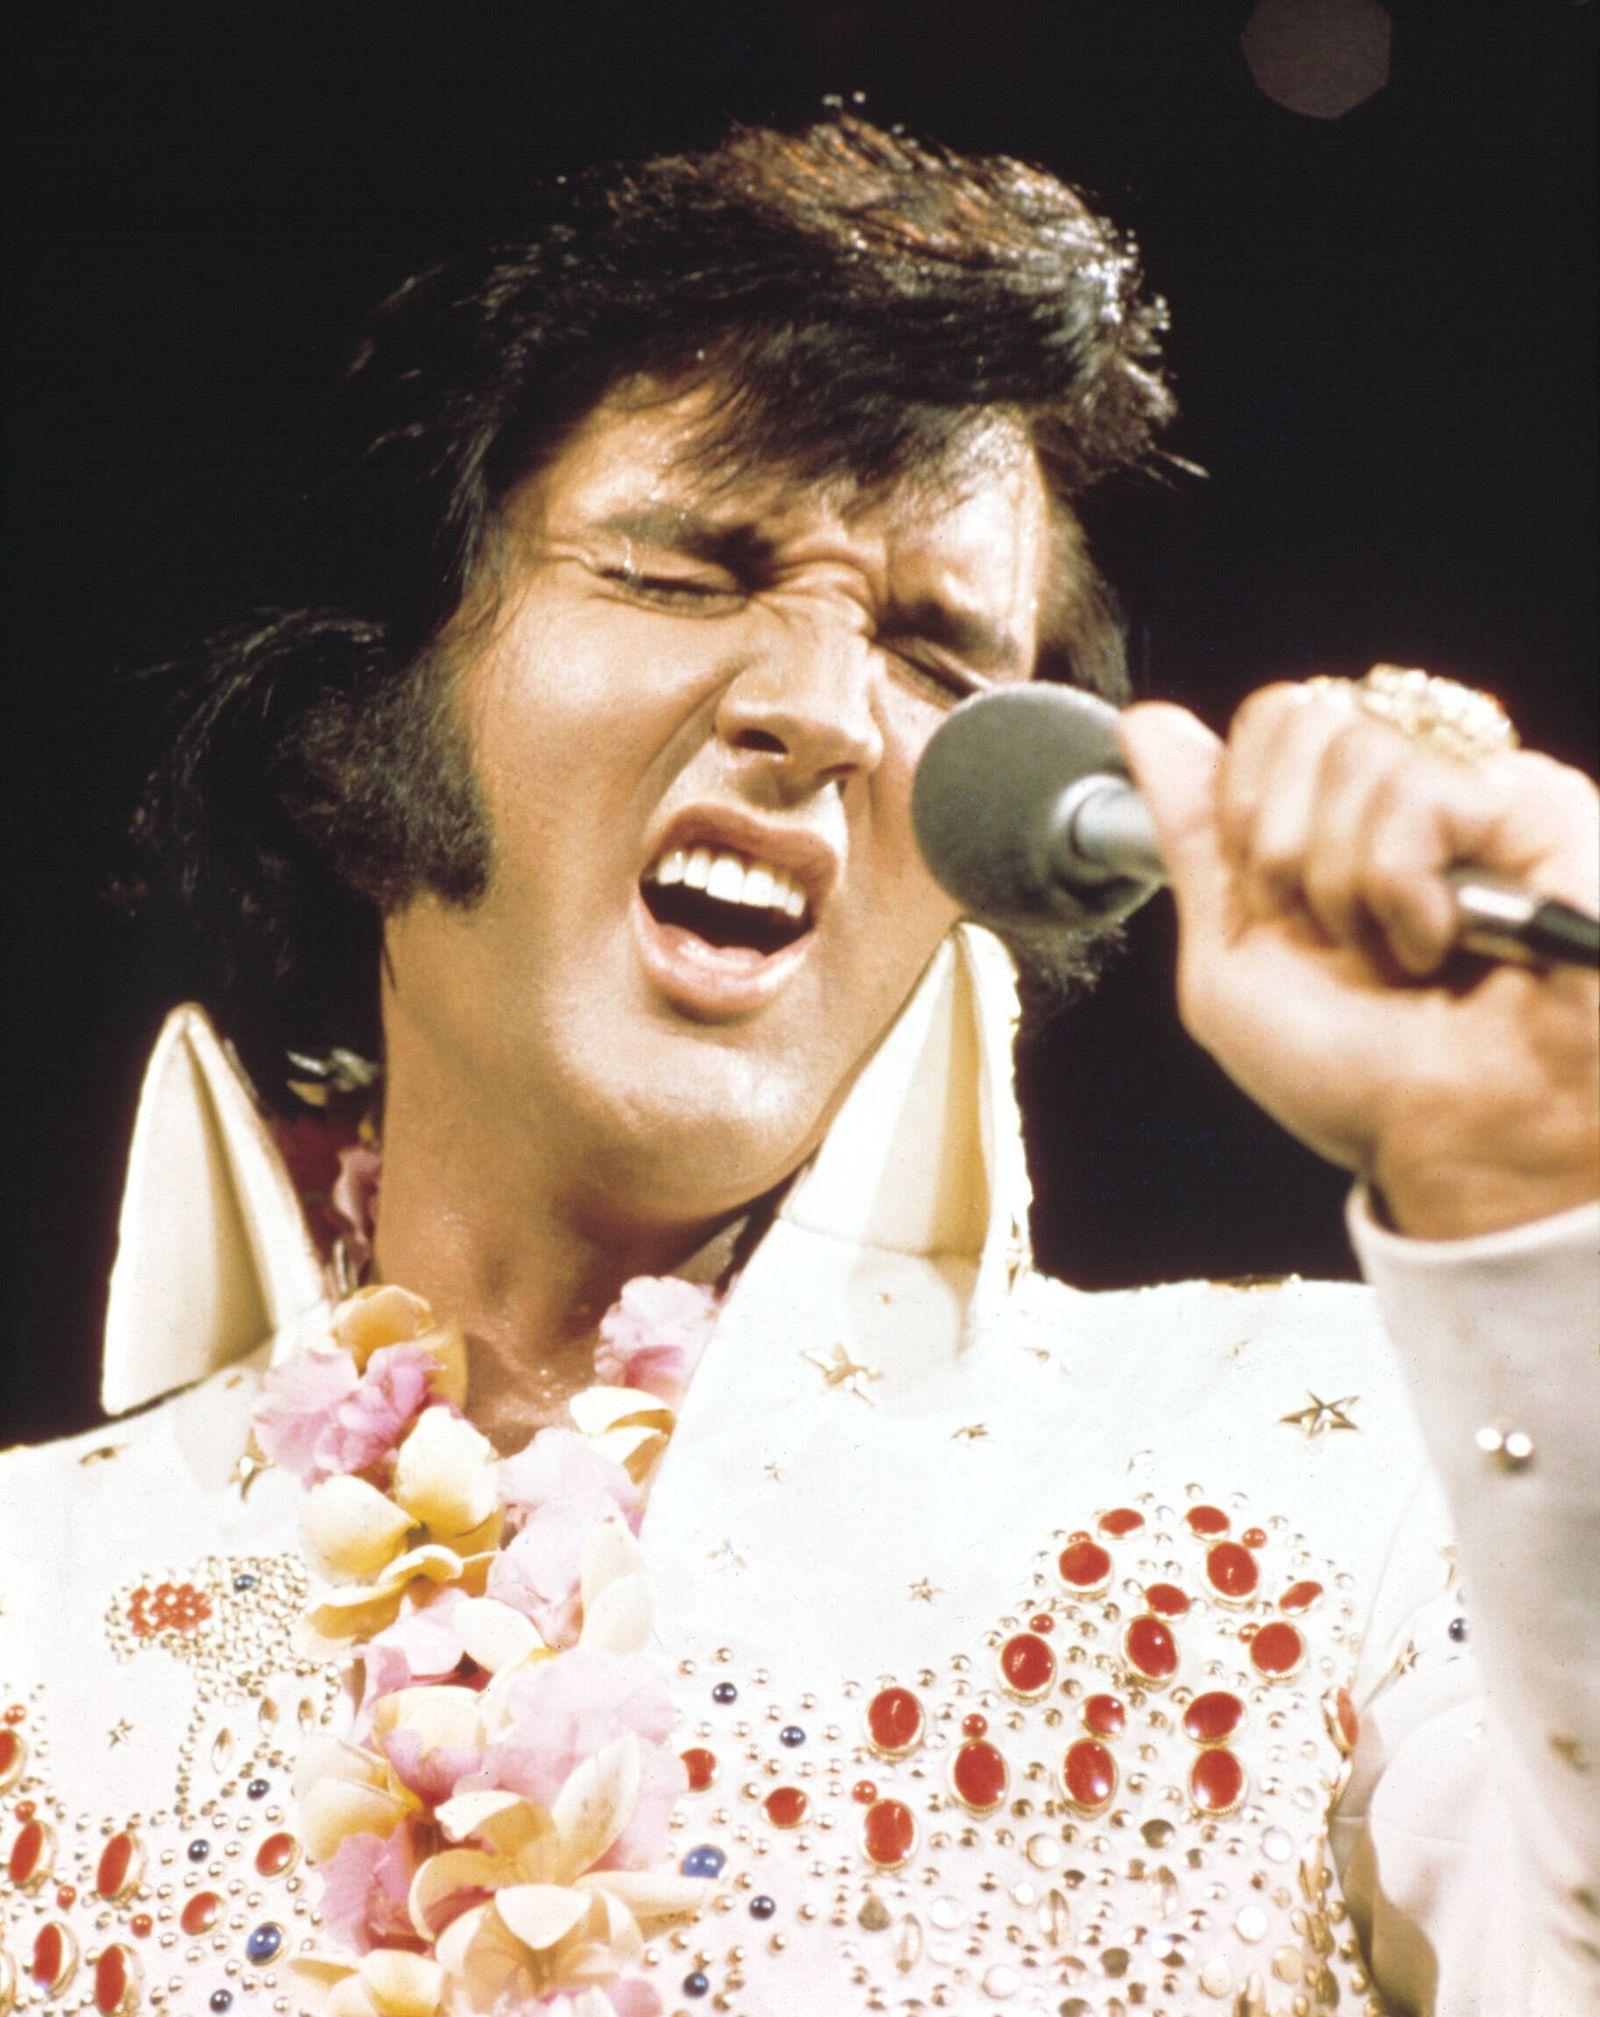 ELVIS-ALOHA FROM HAWAII, Elvis Presley, 1973 Courtesy Everett Collection !ACHTUNG AUFNAHMEDATUM GESCHÄTZT! PUBLICATIONxI